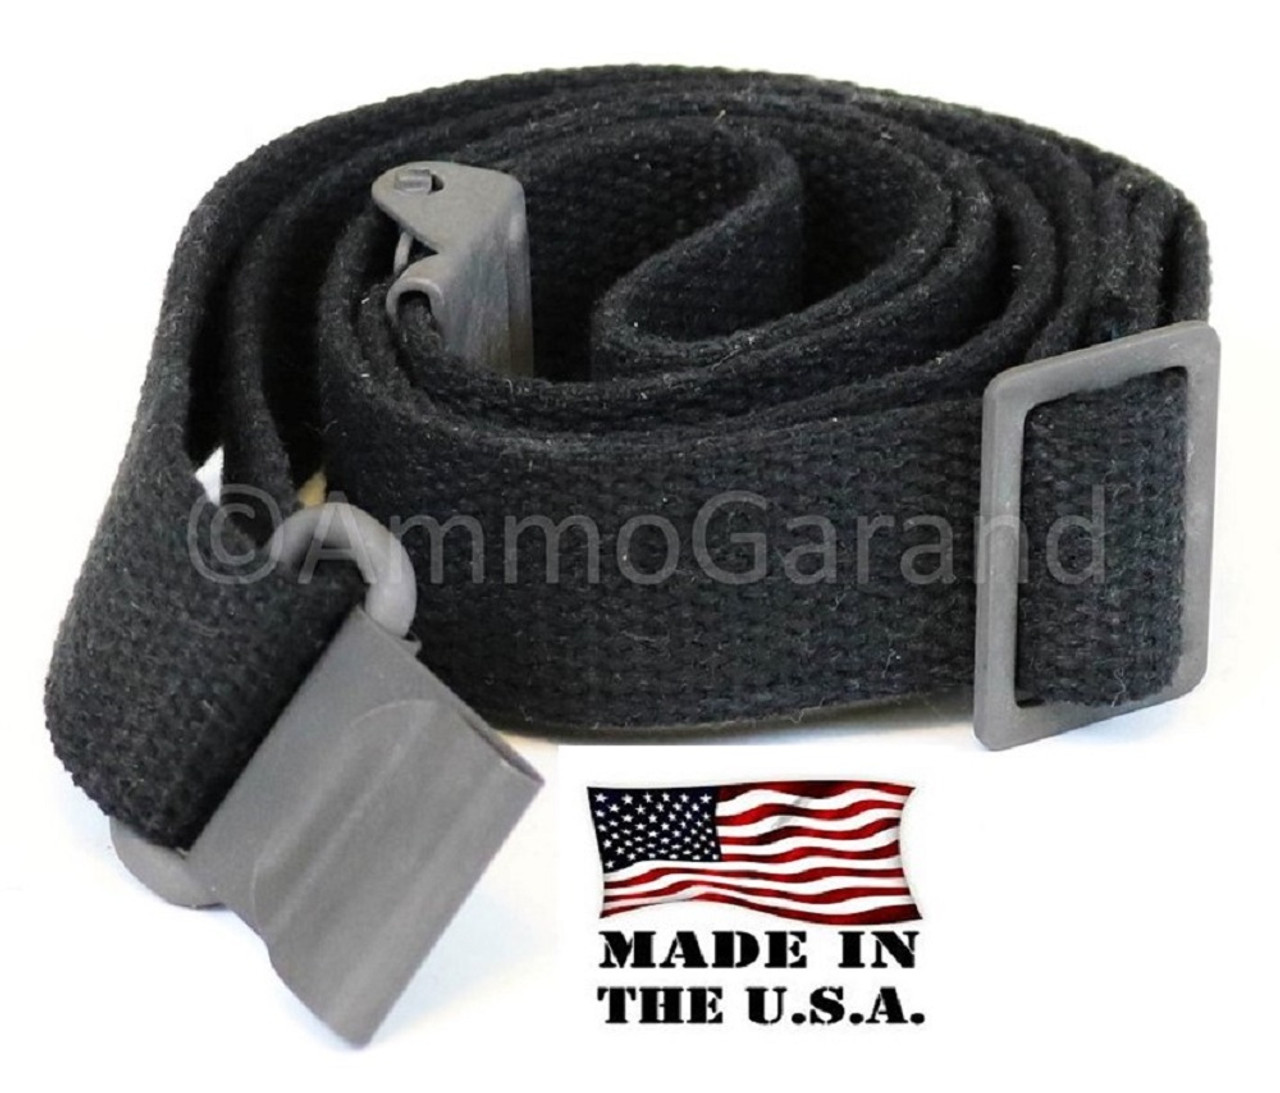 AmmoGarand Black Cotton Web Rifle Sling